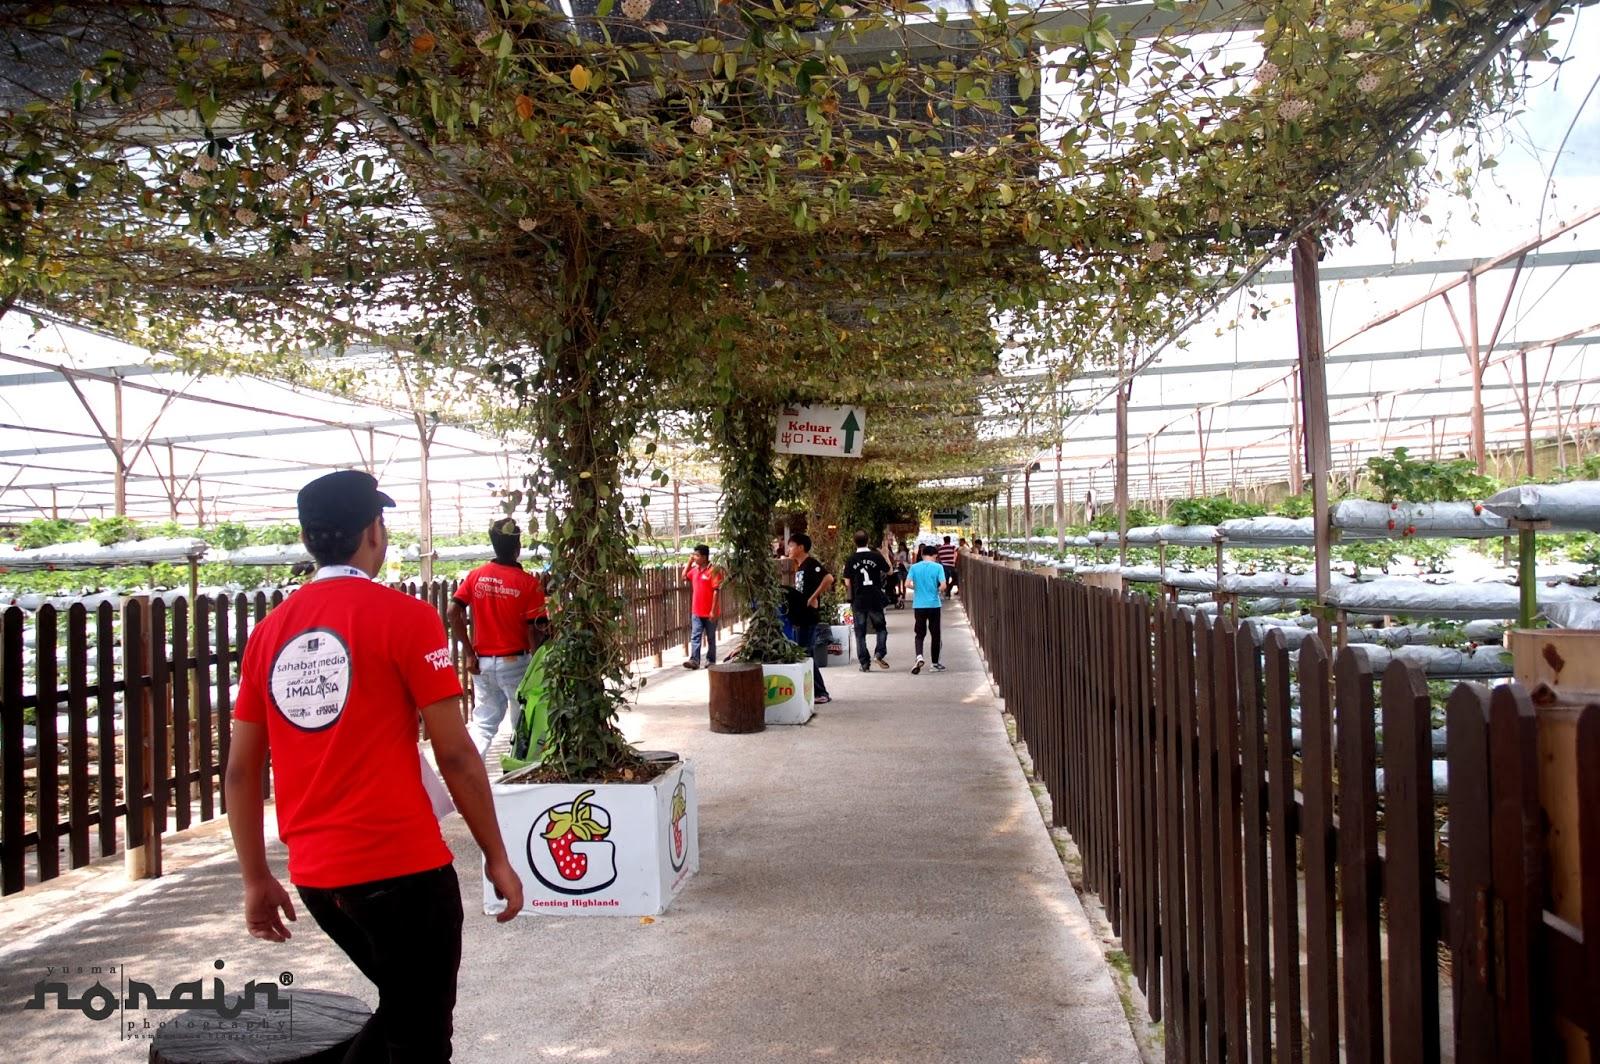 Genting Strawberry Leisure Farm Ladang Strawberi Terbesar Di Malaysia